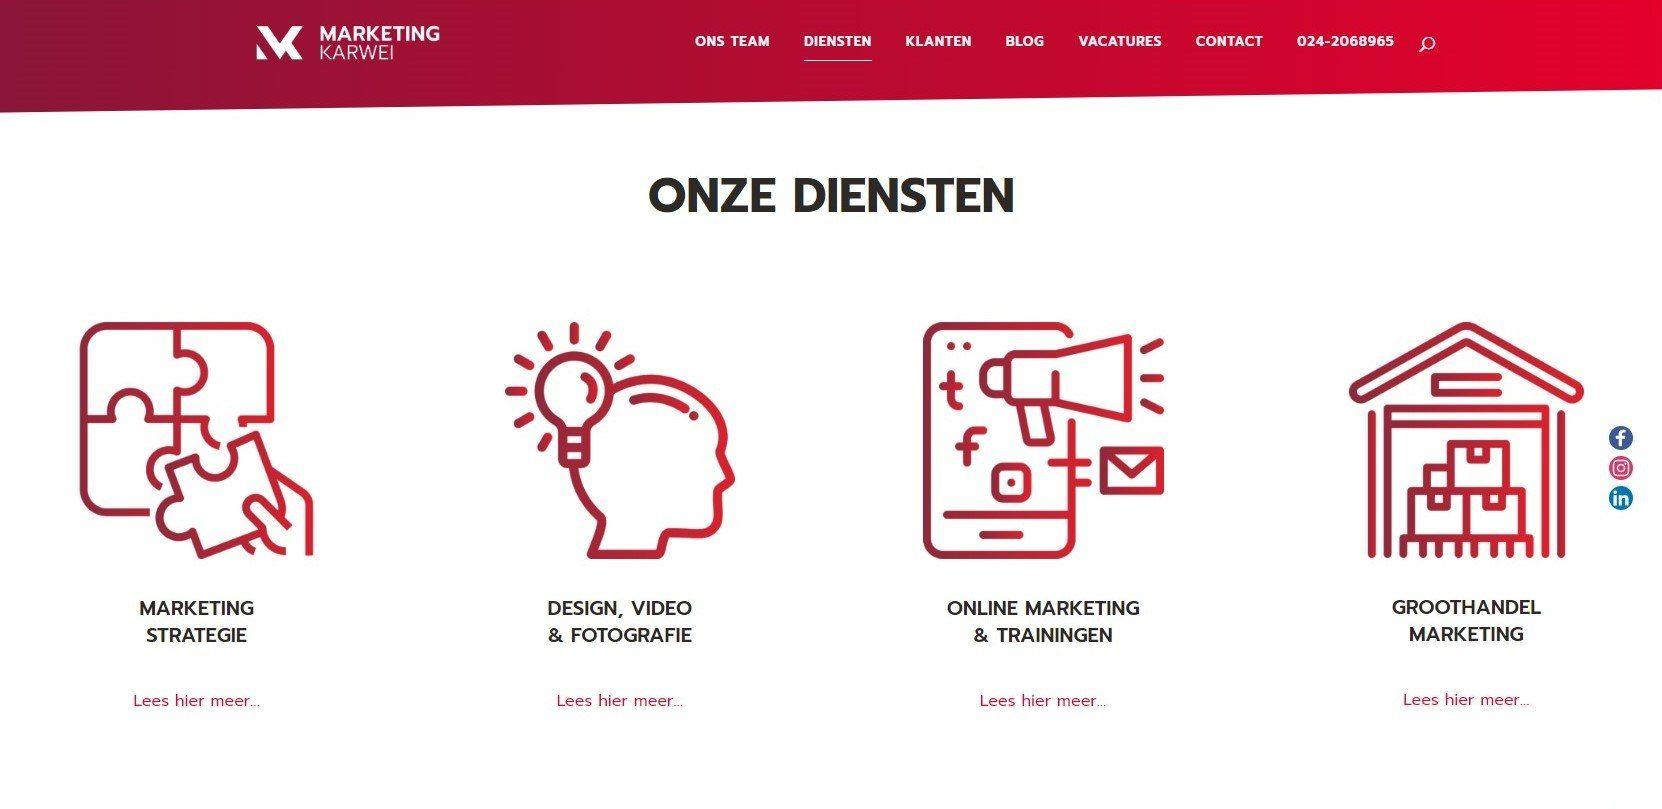 cross-selling - screenshot diensten pagina